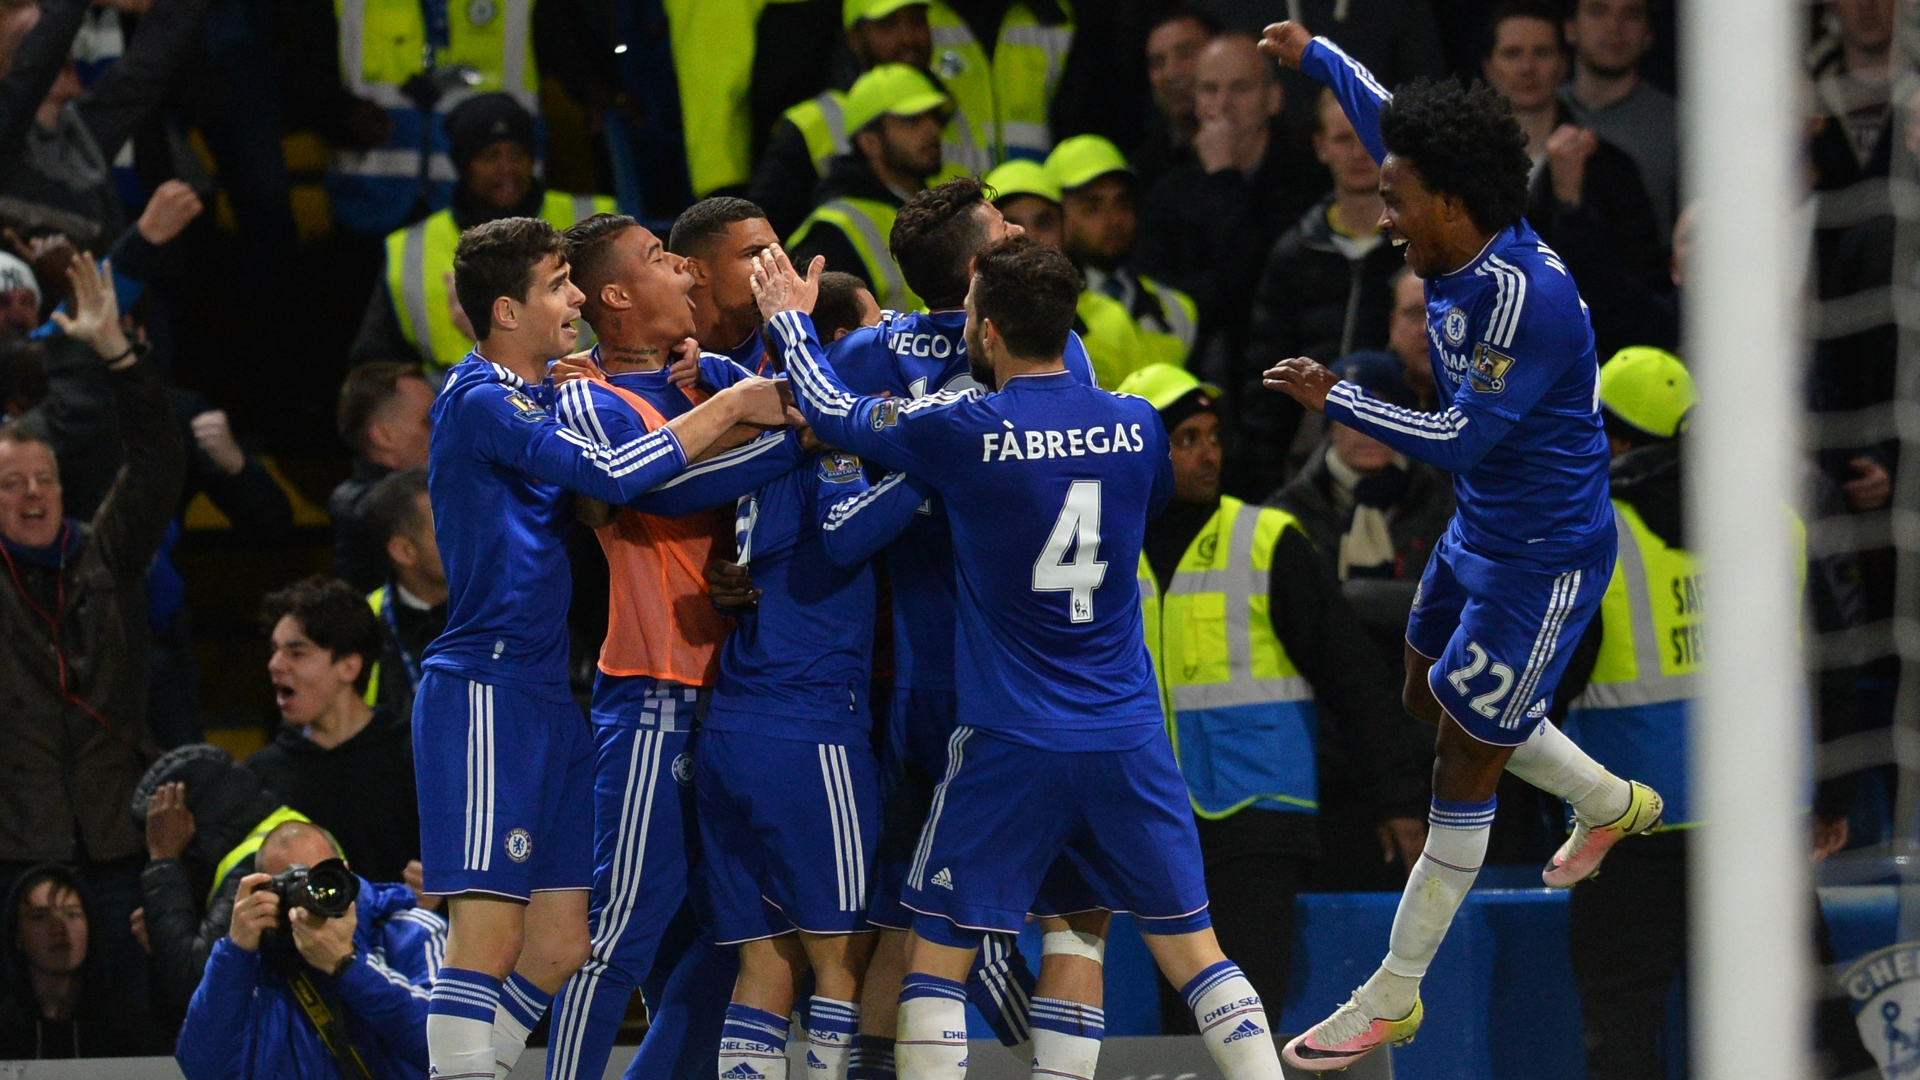 Chelsea celebrate second goal vs Tottenham